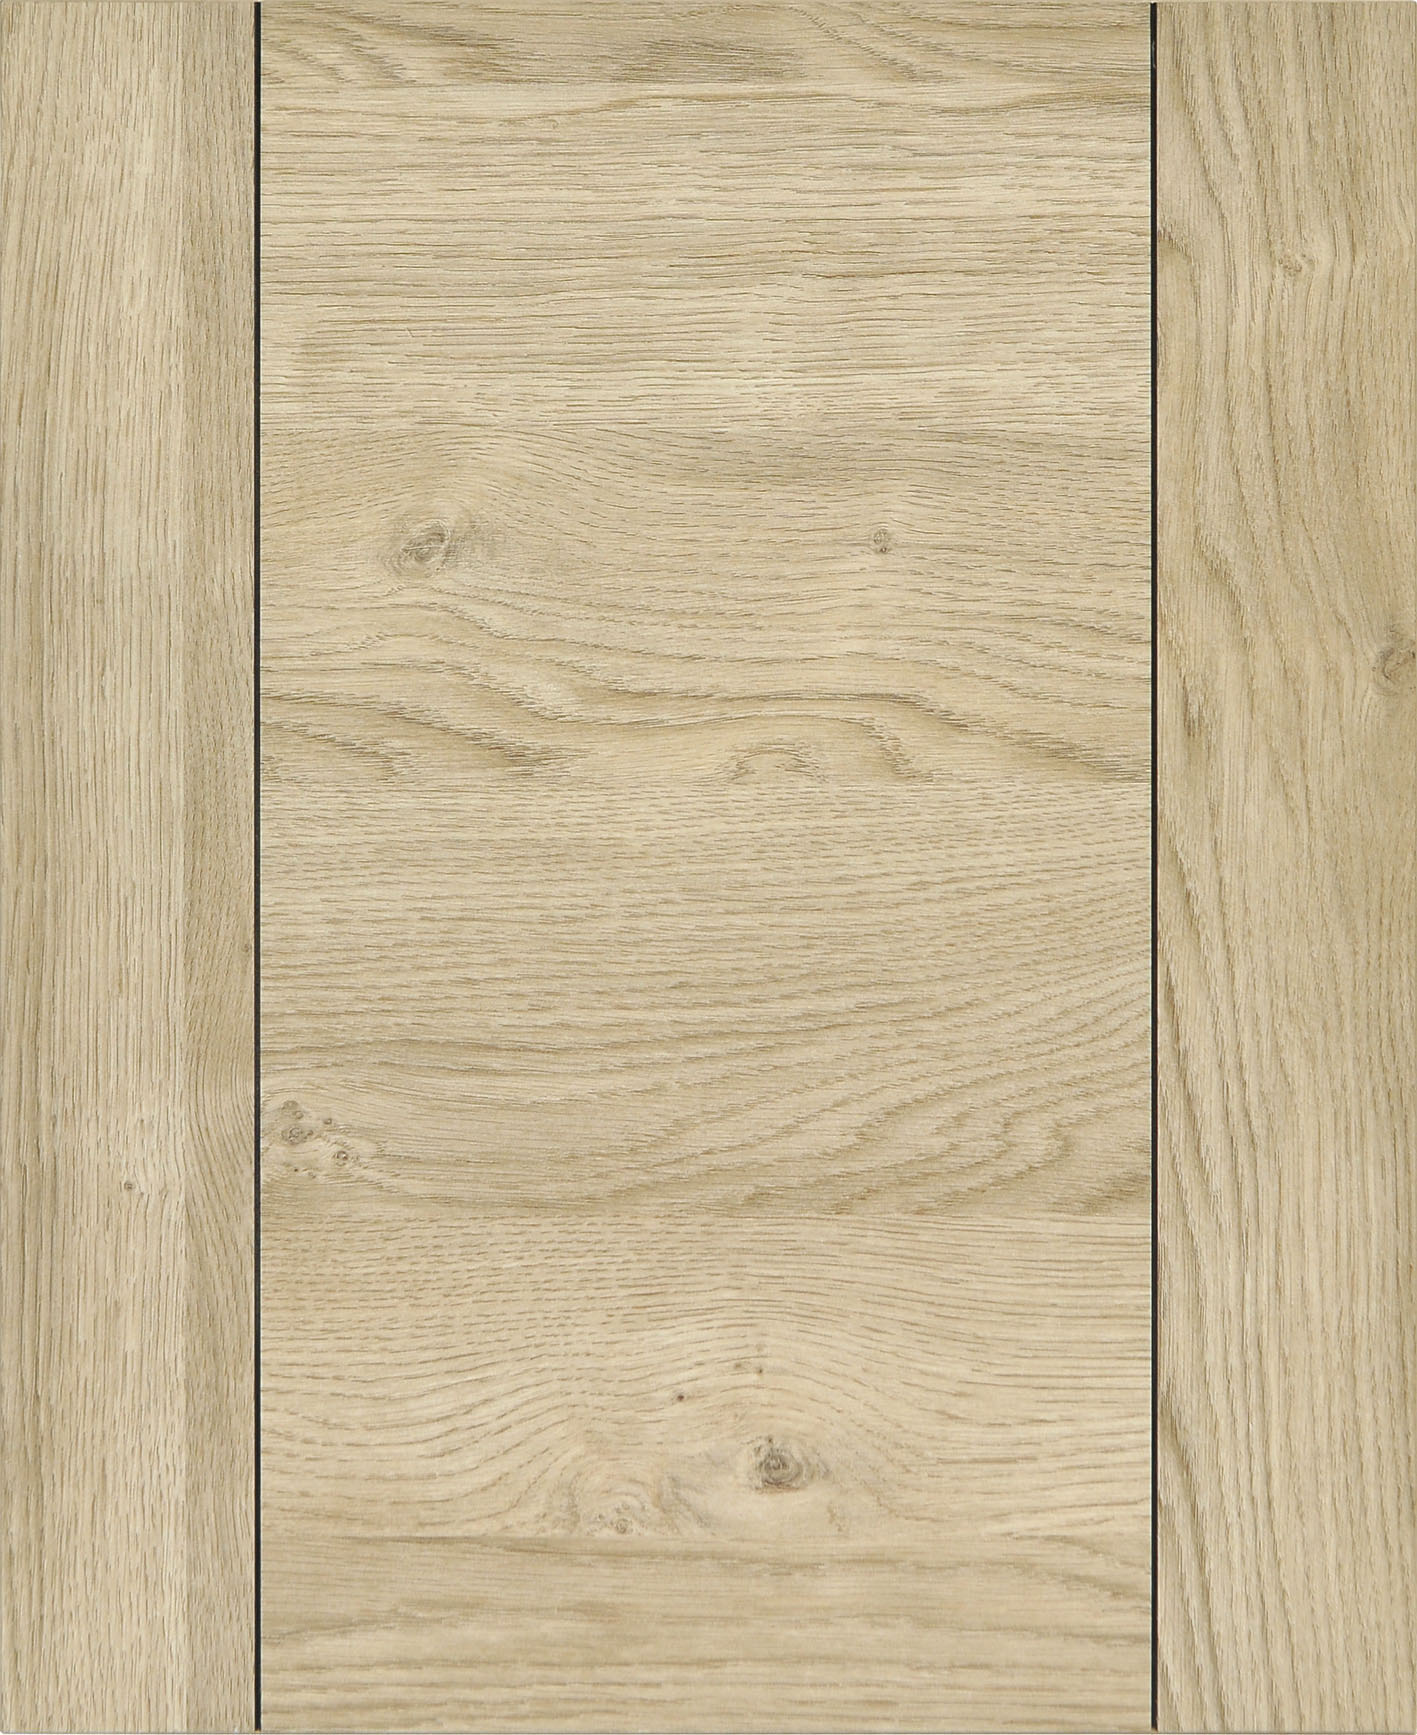 Flat Frame 1584-FL